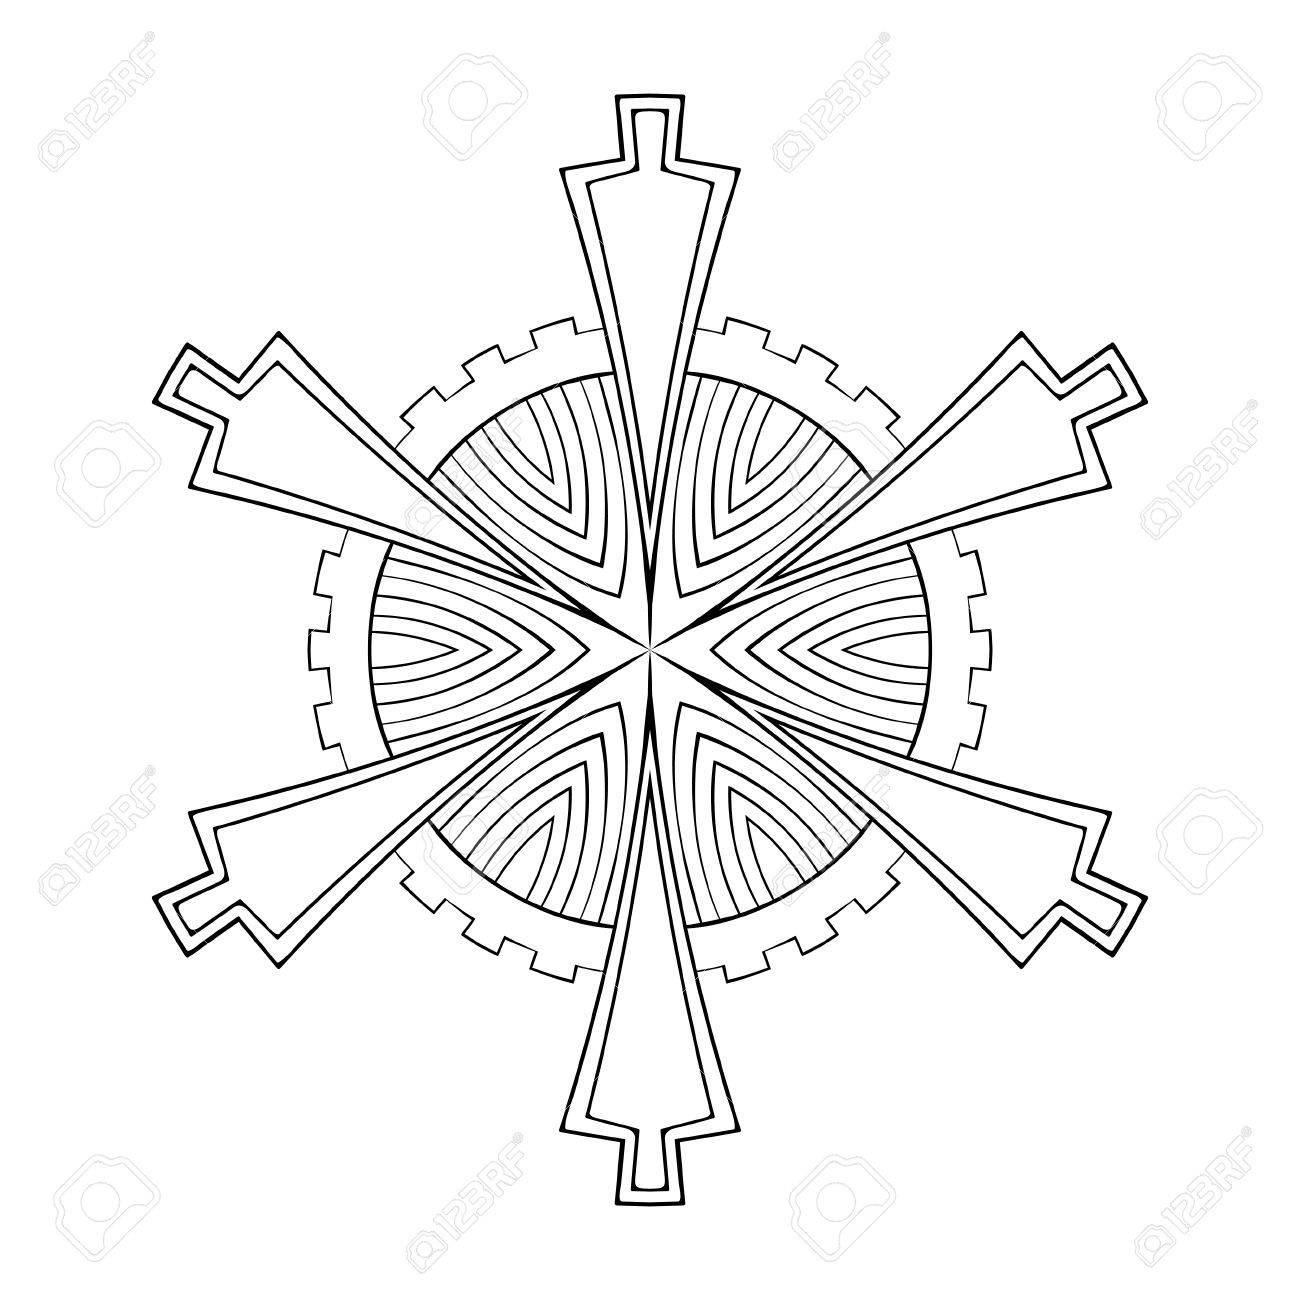 Vektor-Papier-Ausschnitt Schneeflocke In Zentangle Geometrischen ...